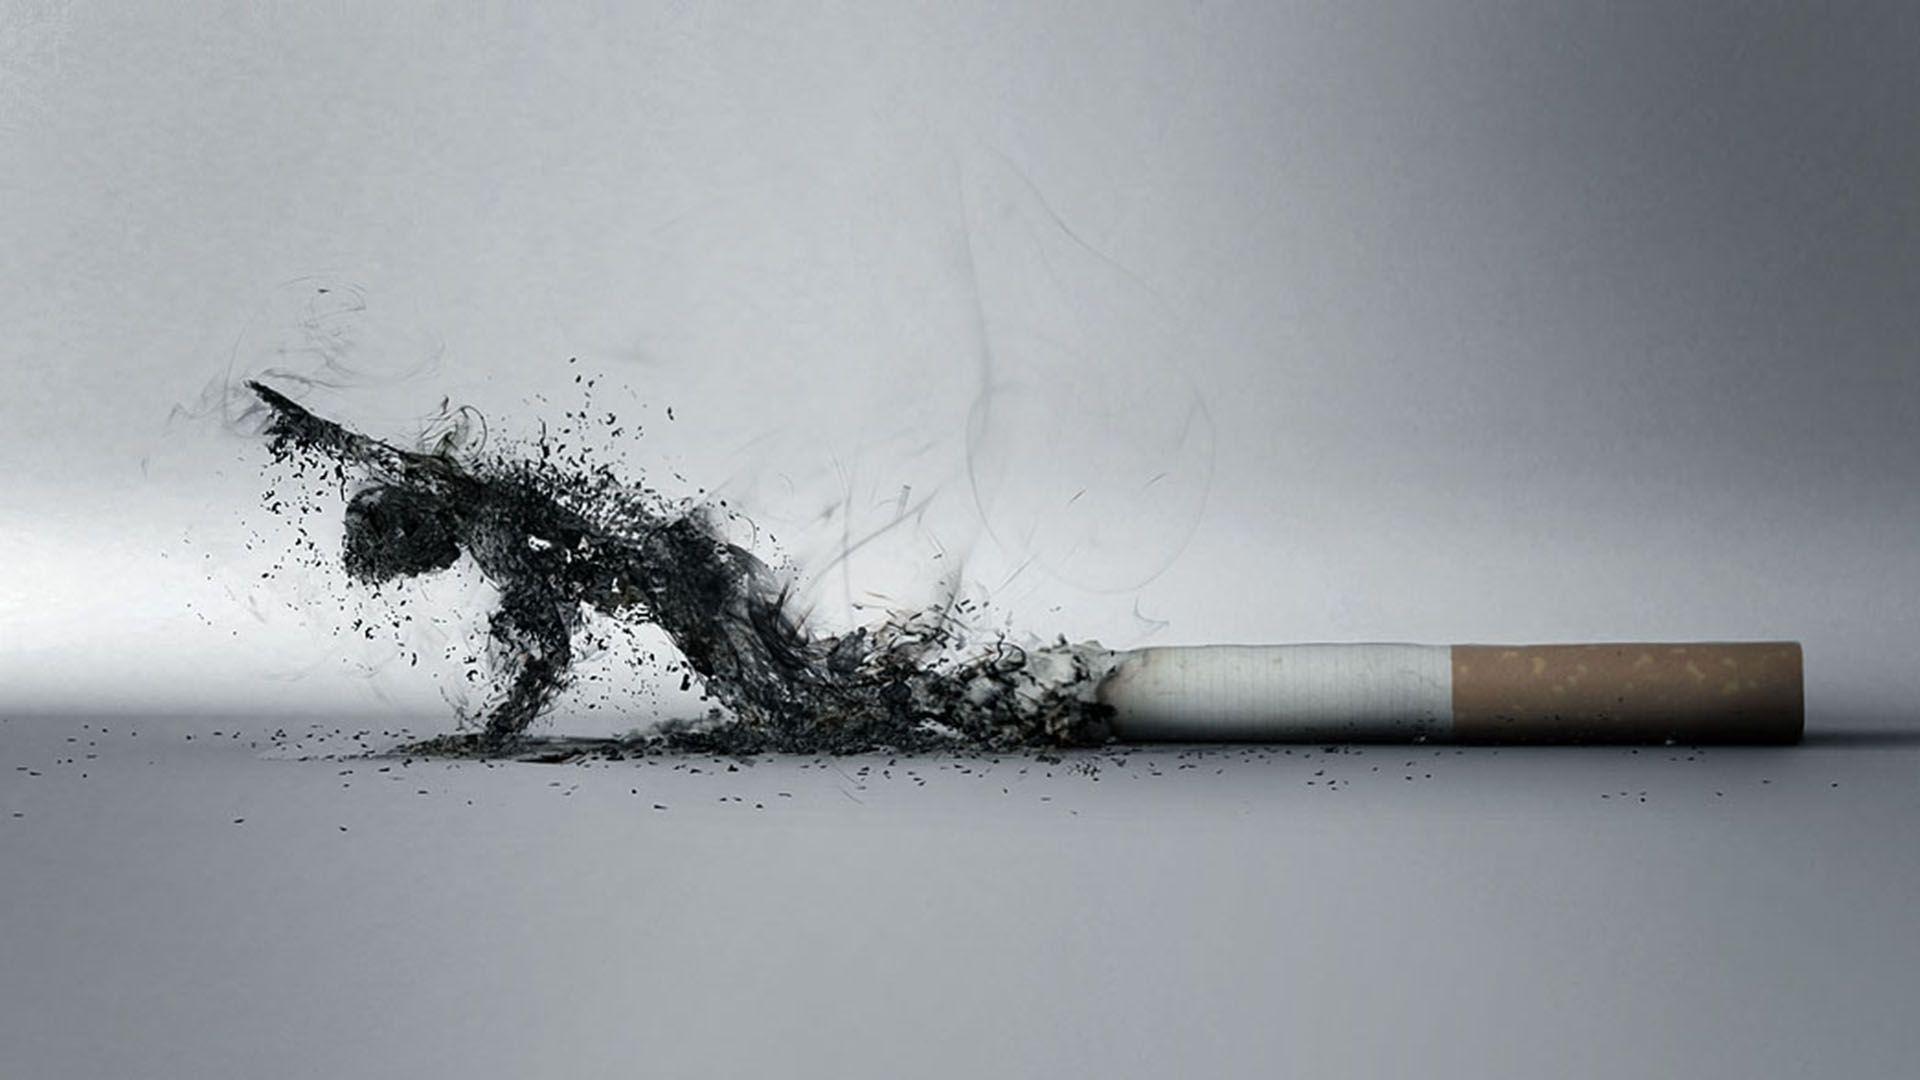 Smoking Kills - Don't Let It Get You